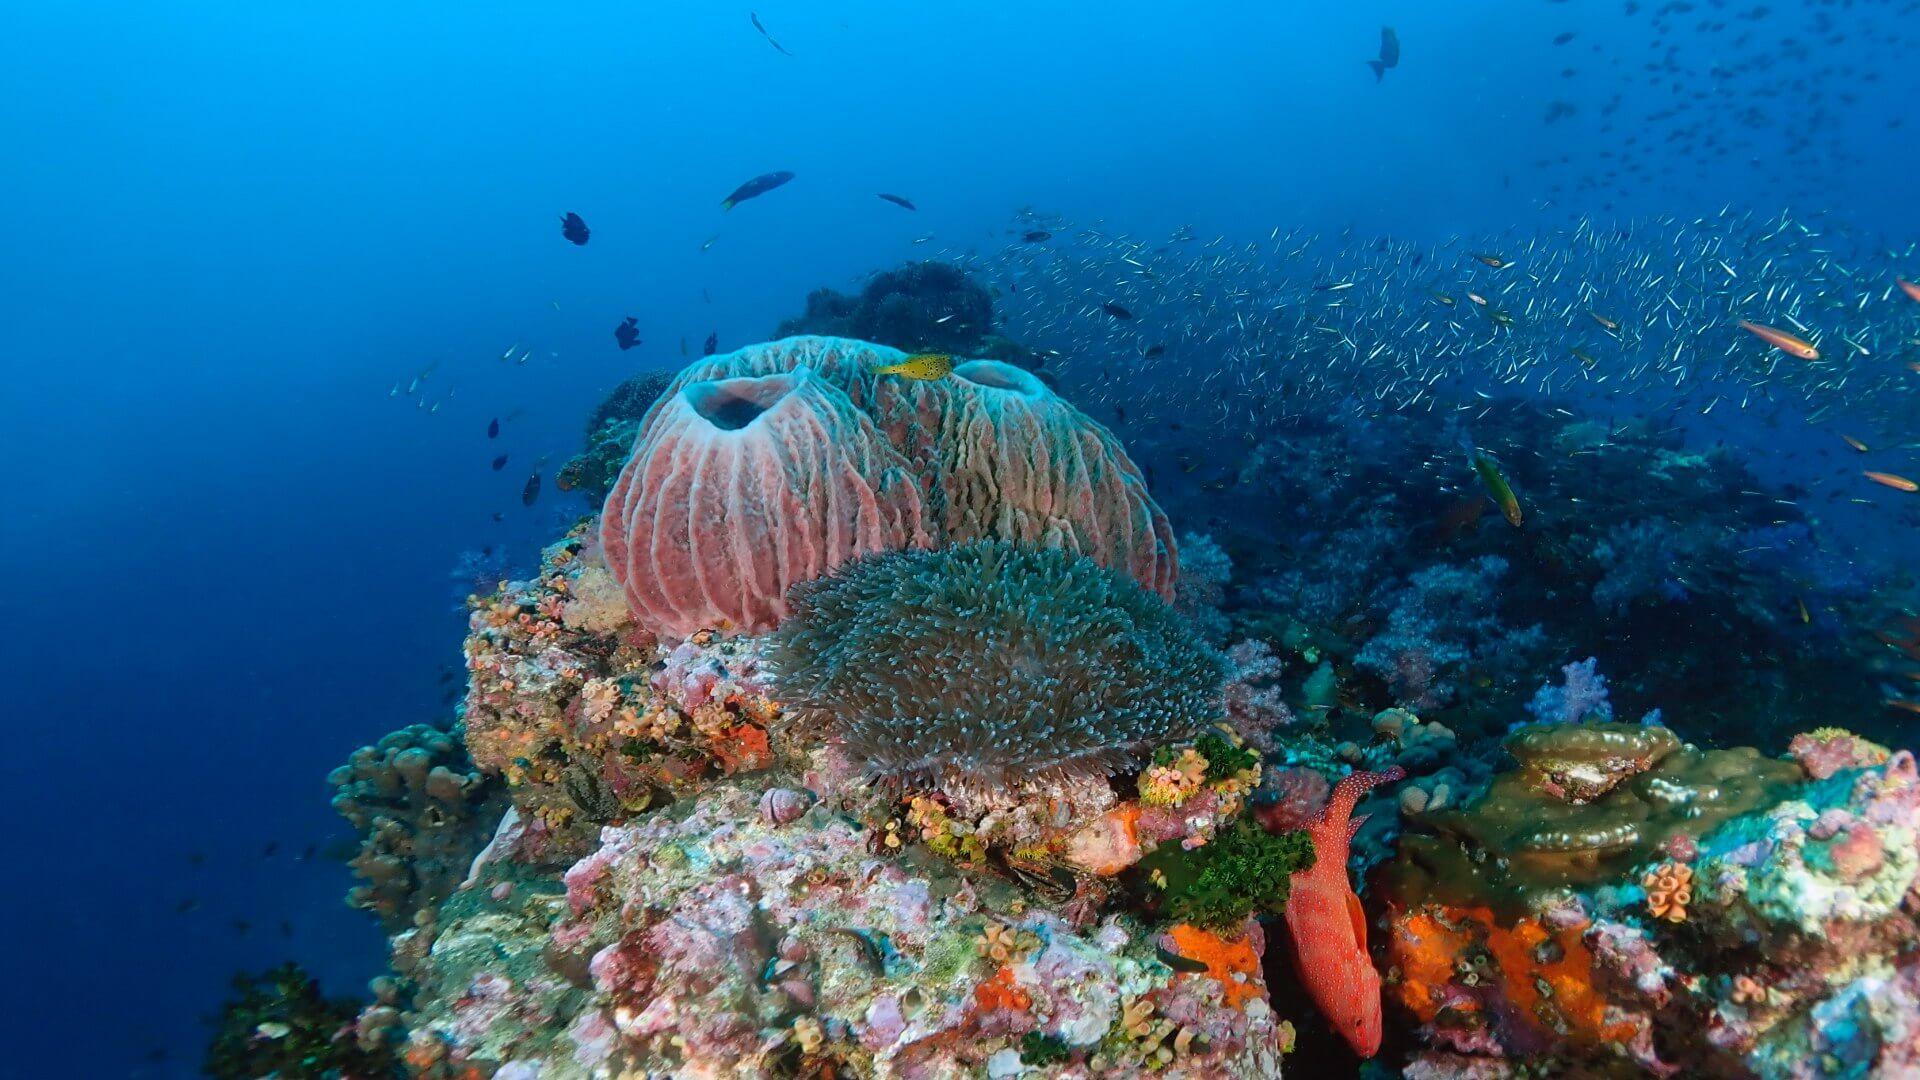 10% Early Booking Discount For Similan Island Liveaboard MV Pawara